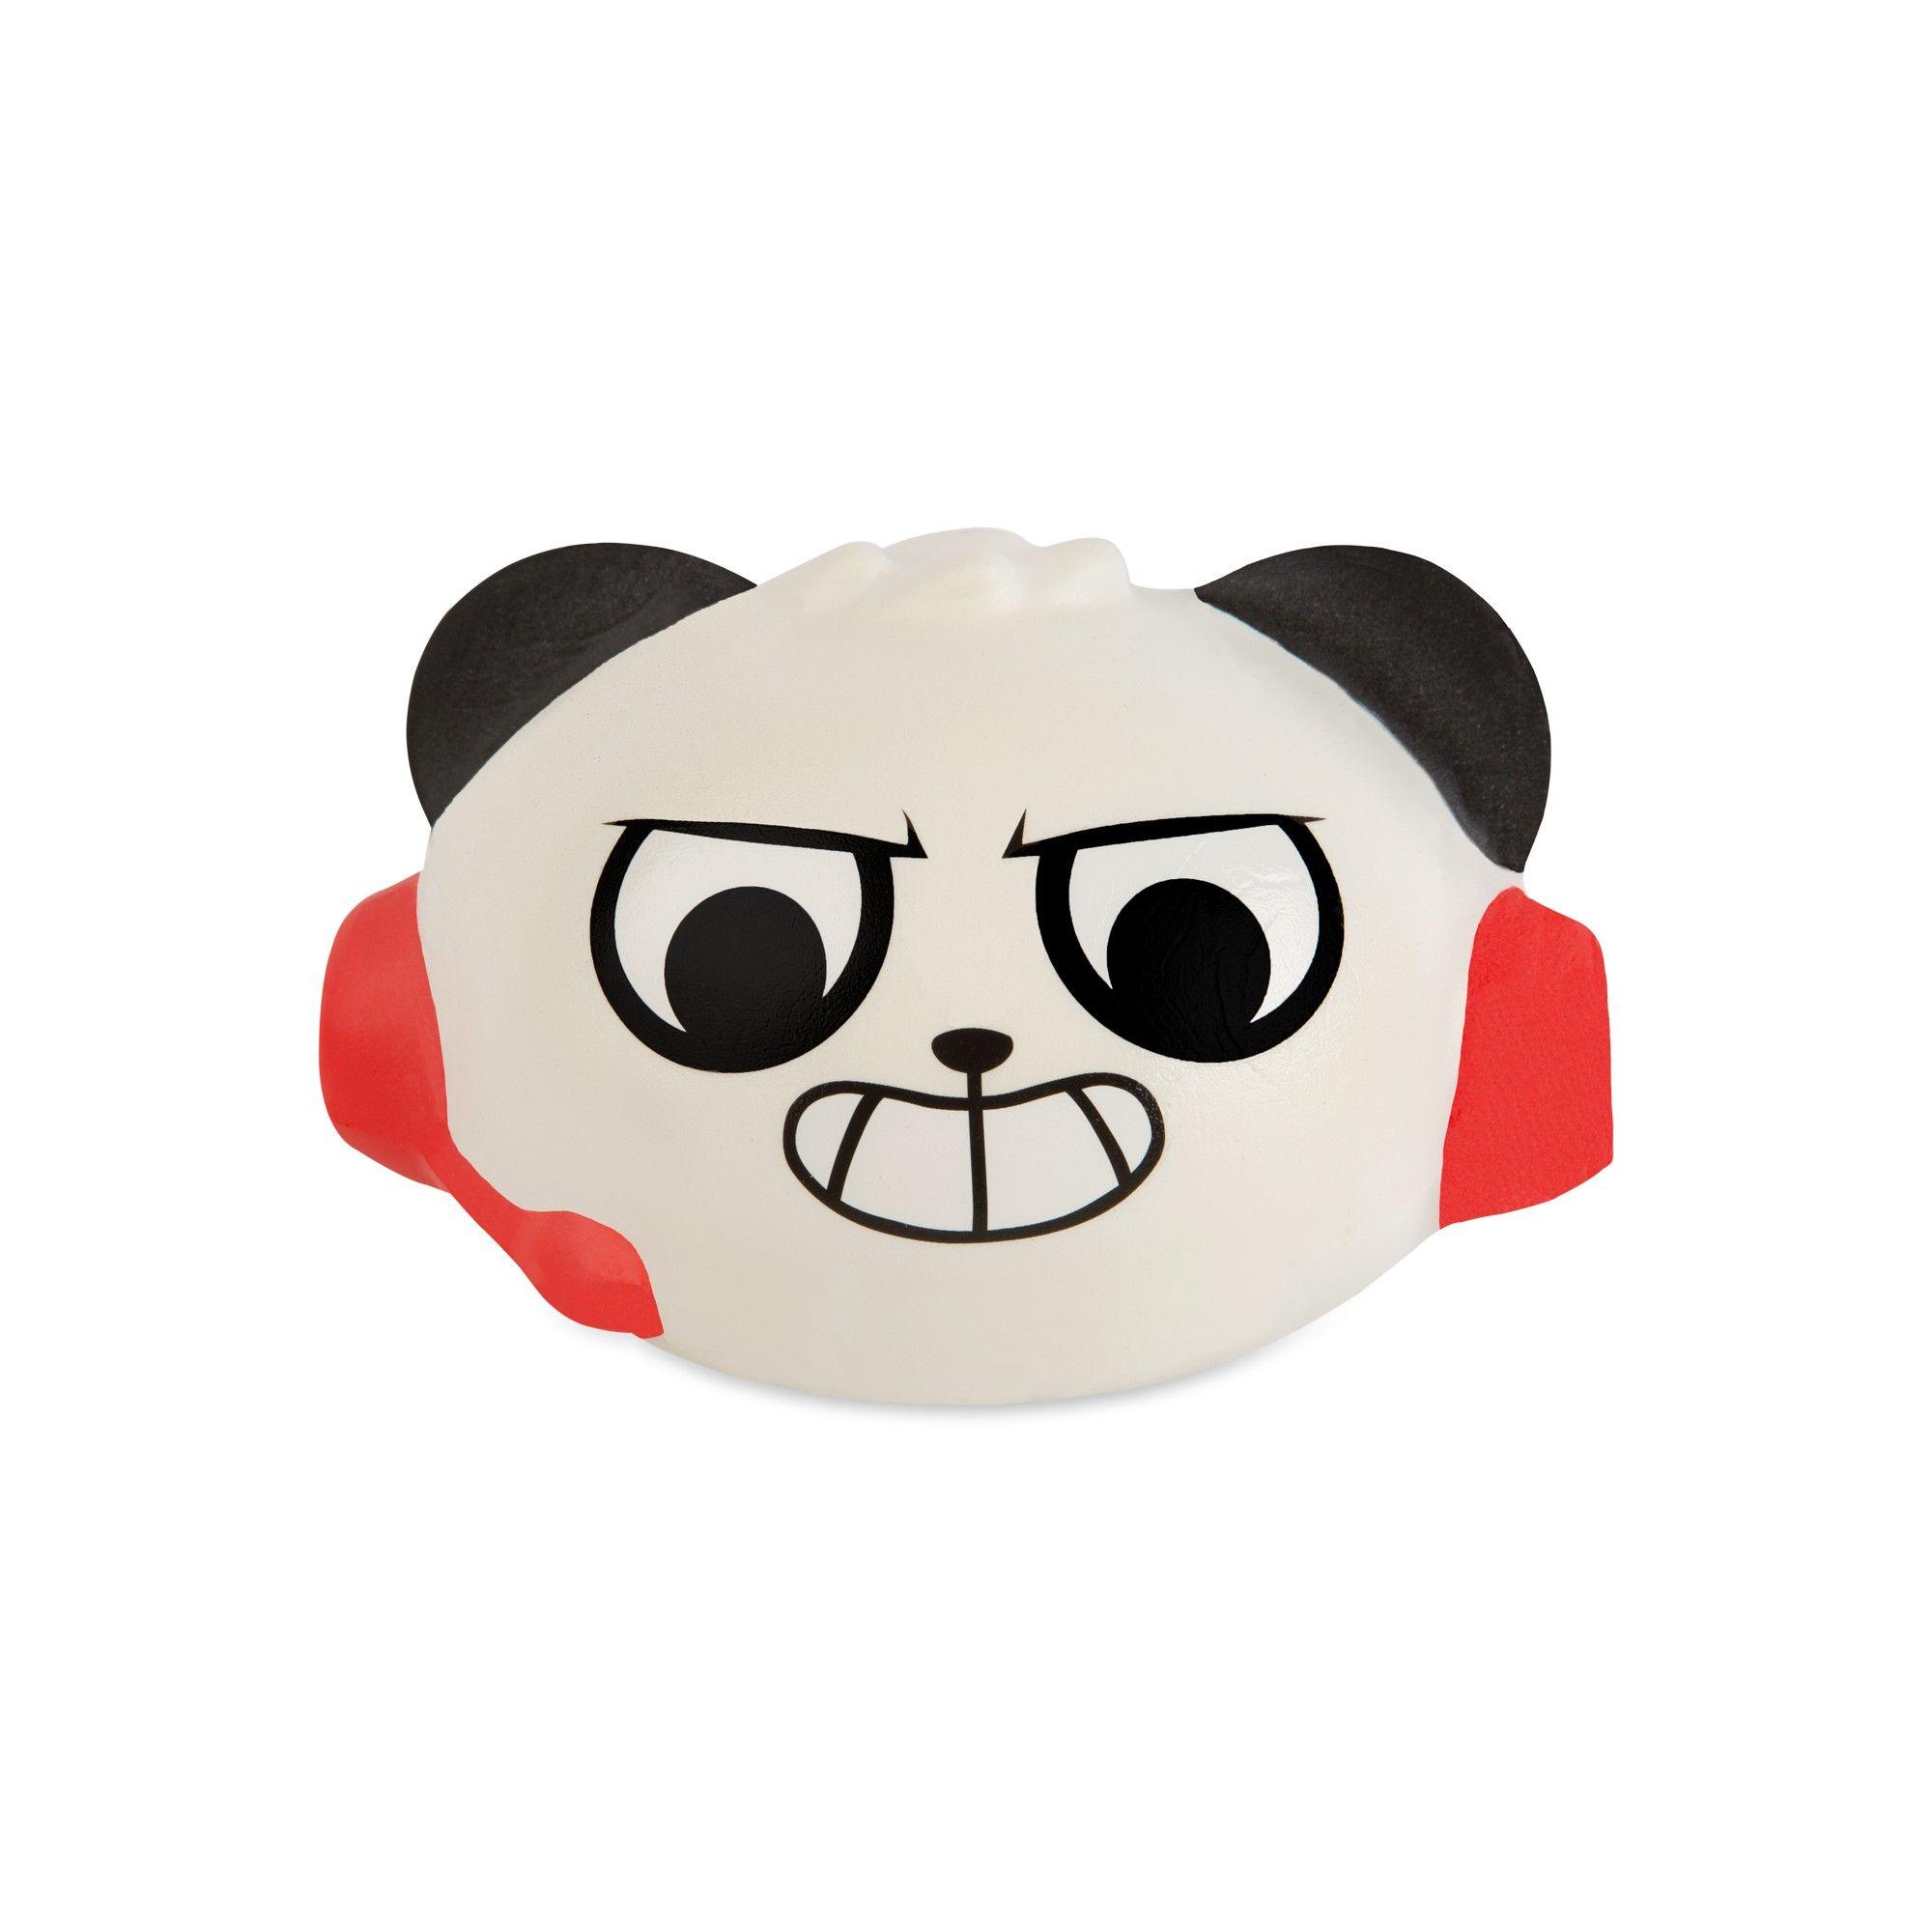 Ryan's World Sns Panda, Mini Figures Floral pillows